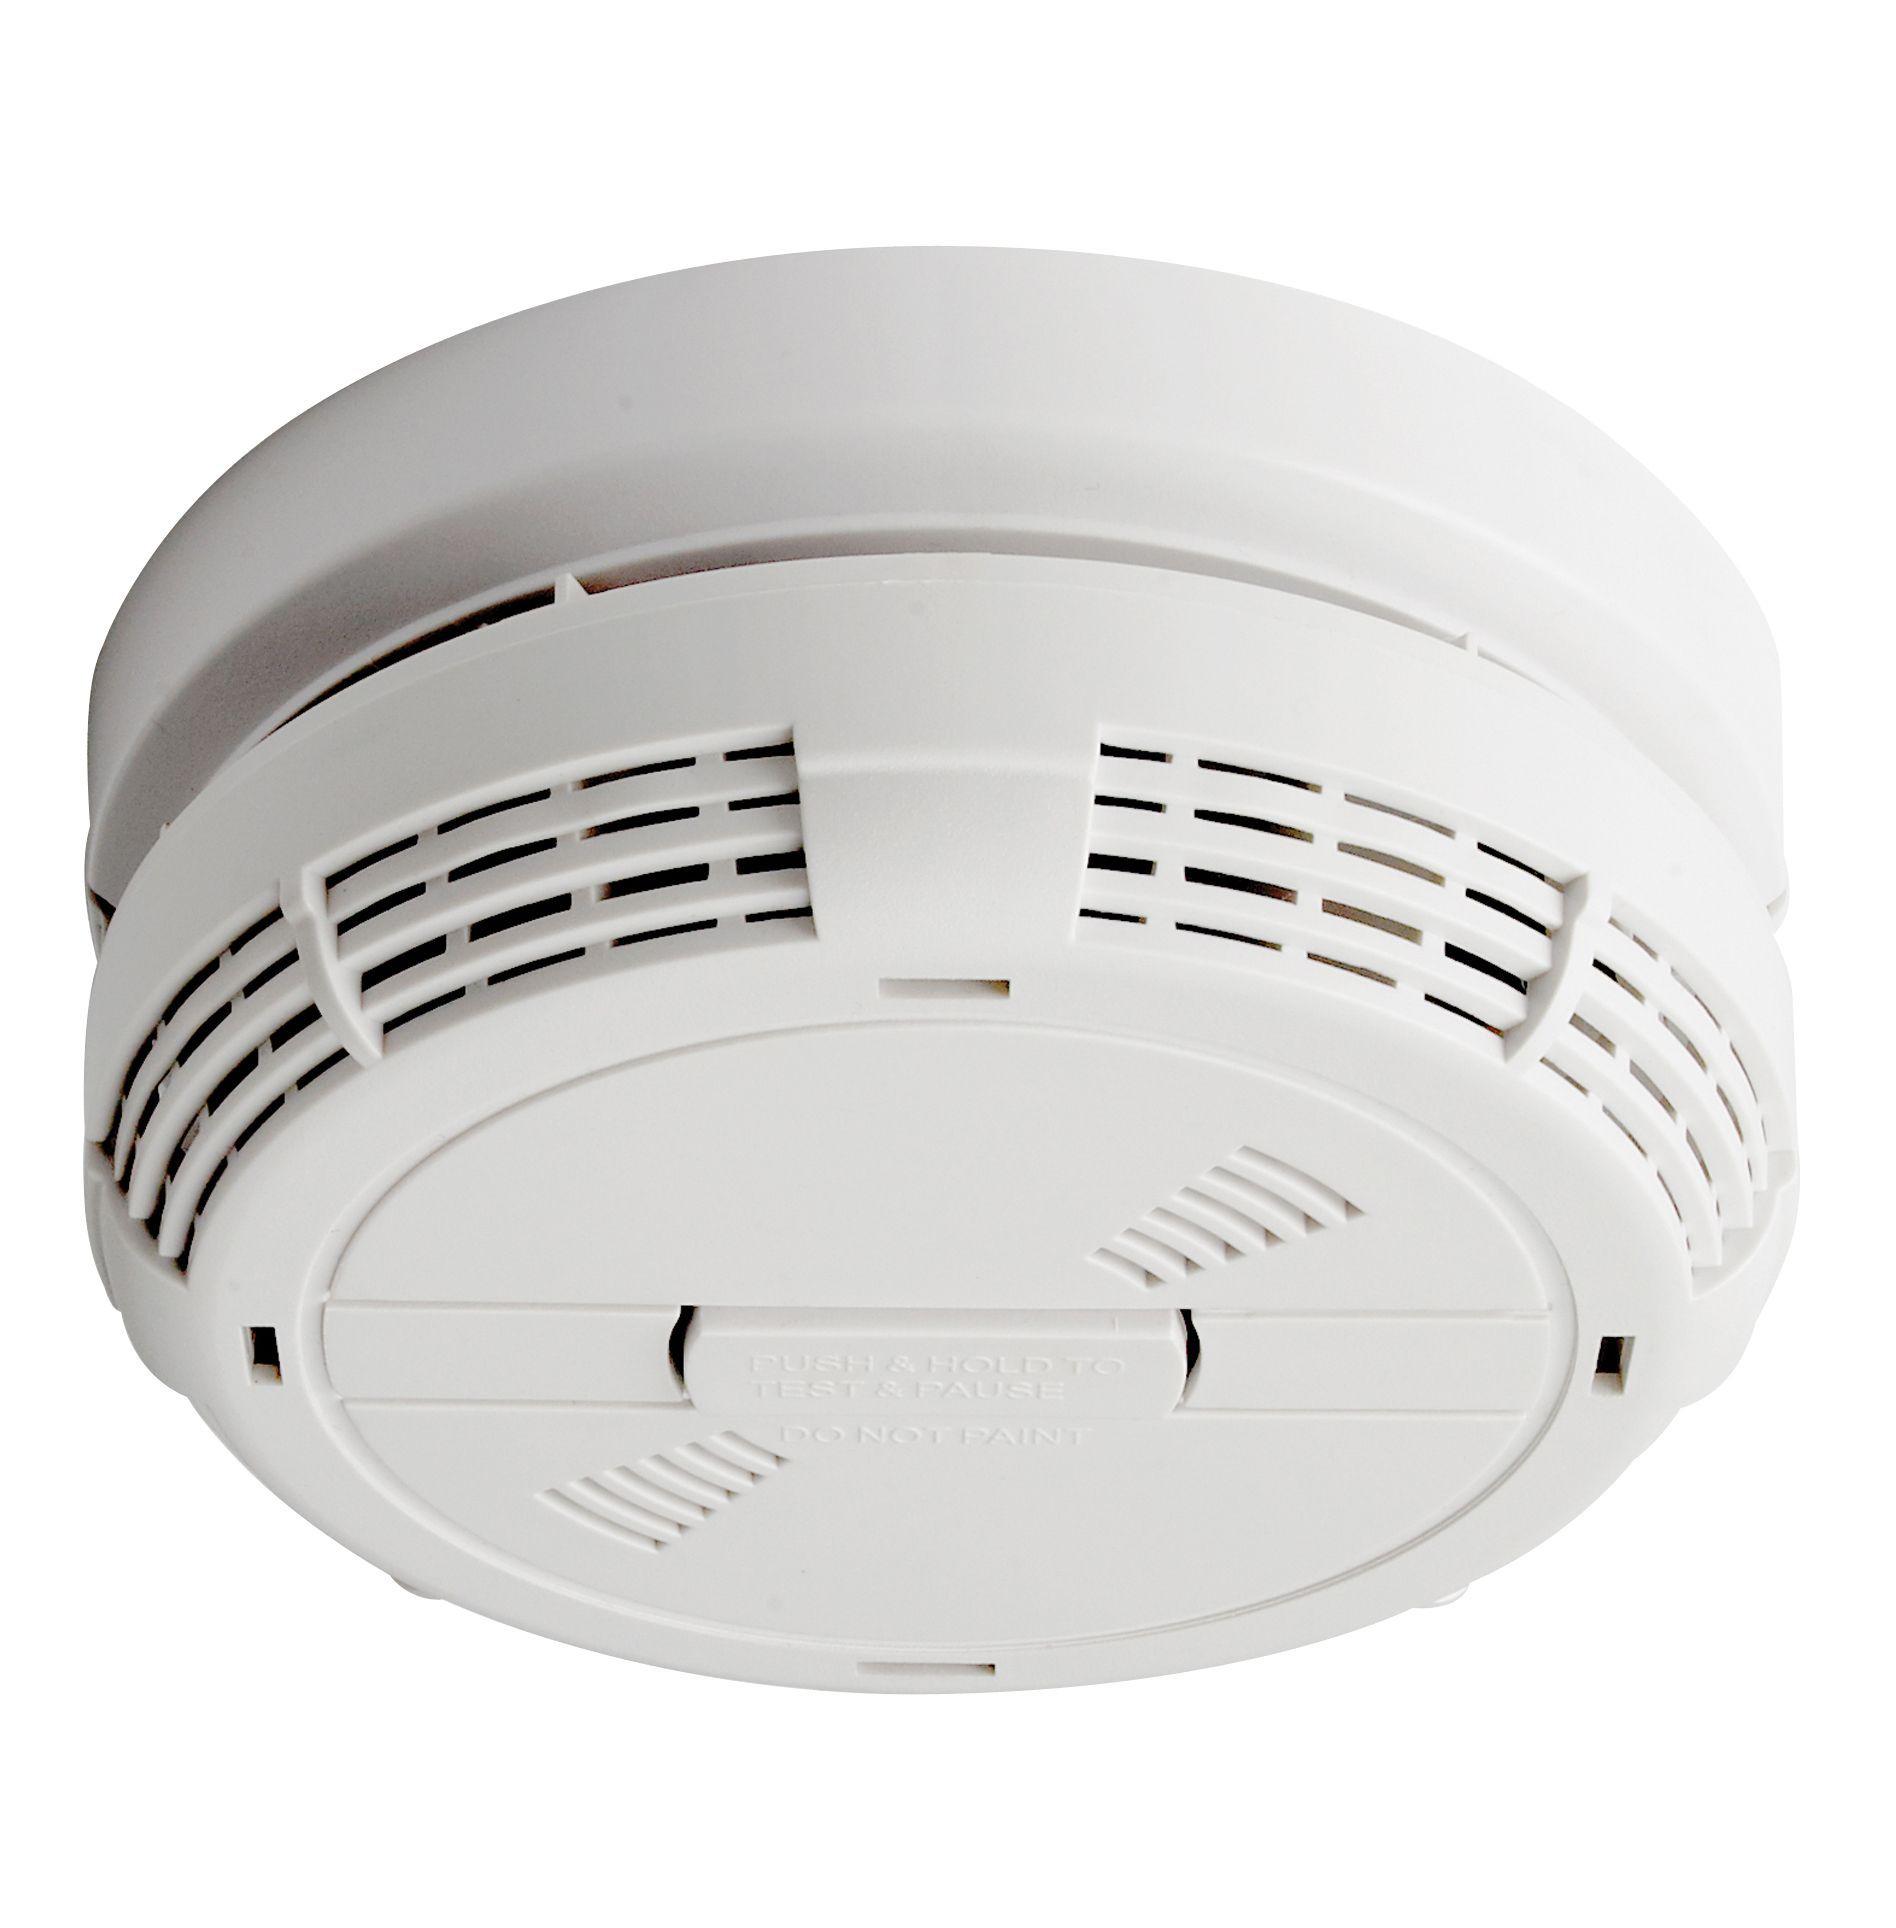 fireangel optical mains powered smoke alarm departments. Black Bedroom Furniture Sets. Home Design Ideas